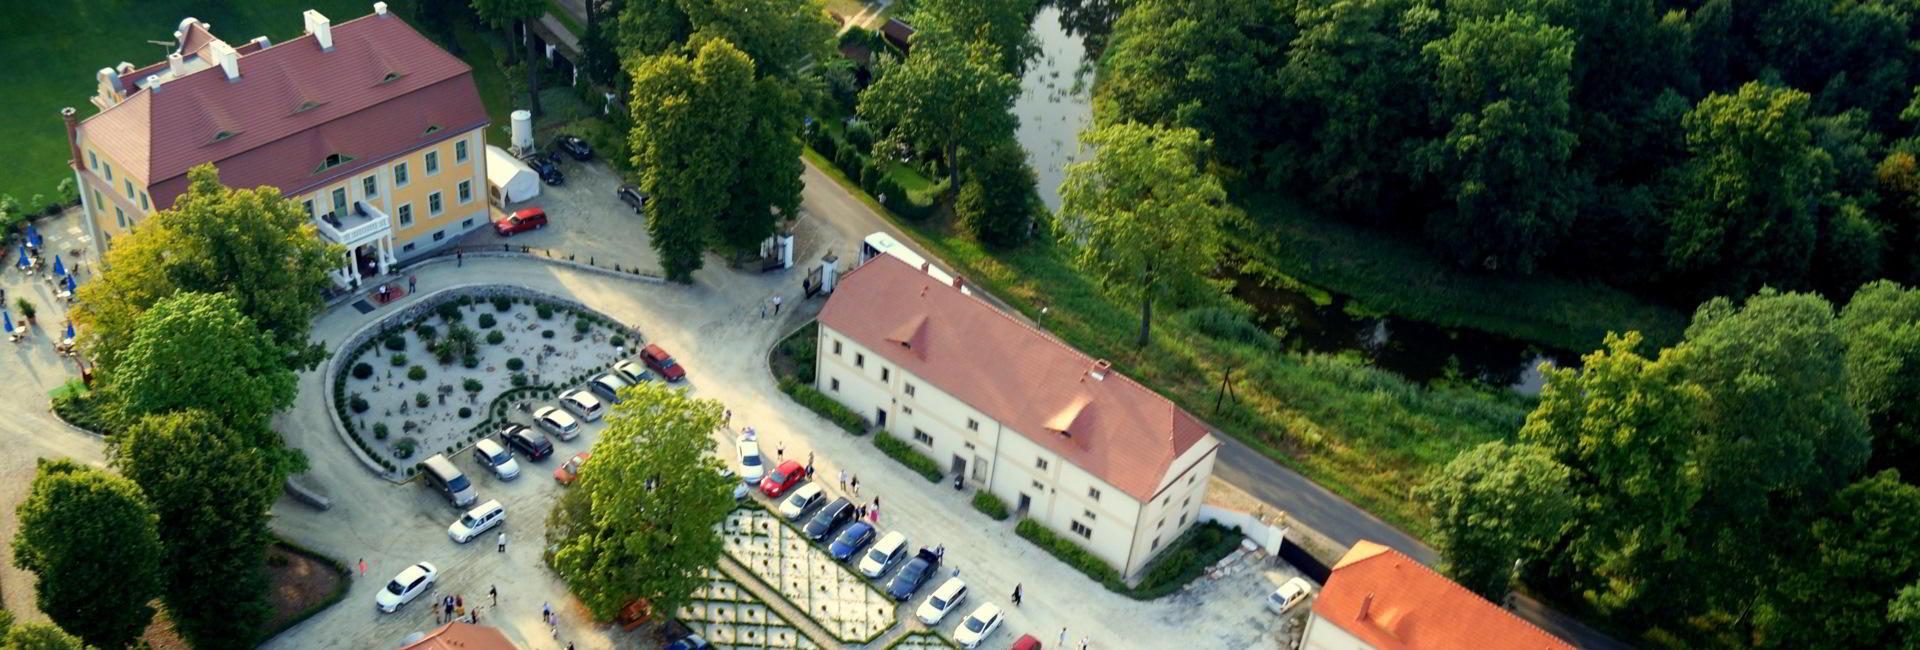 Palac Wiechlice in Szprotawa, Silesia, Poland